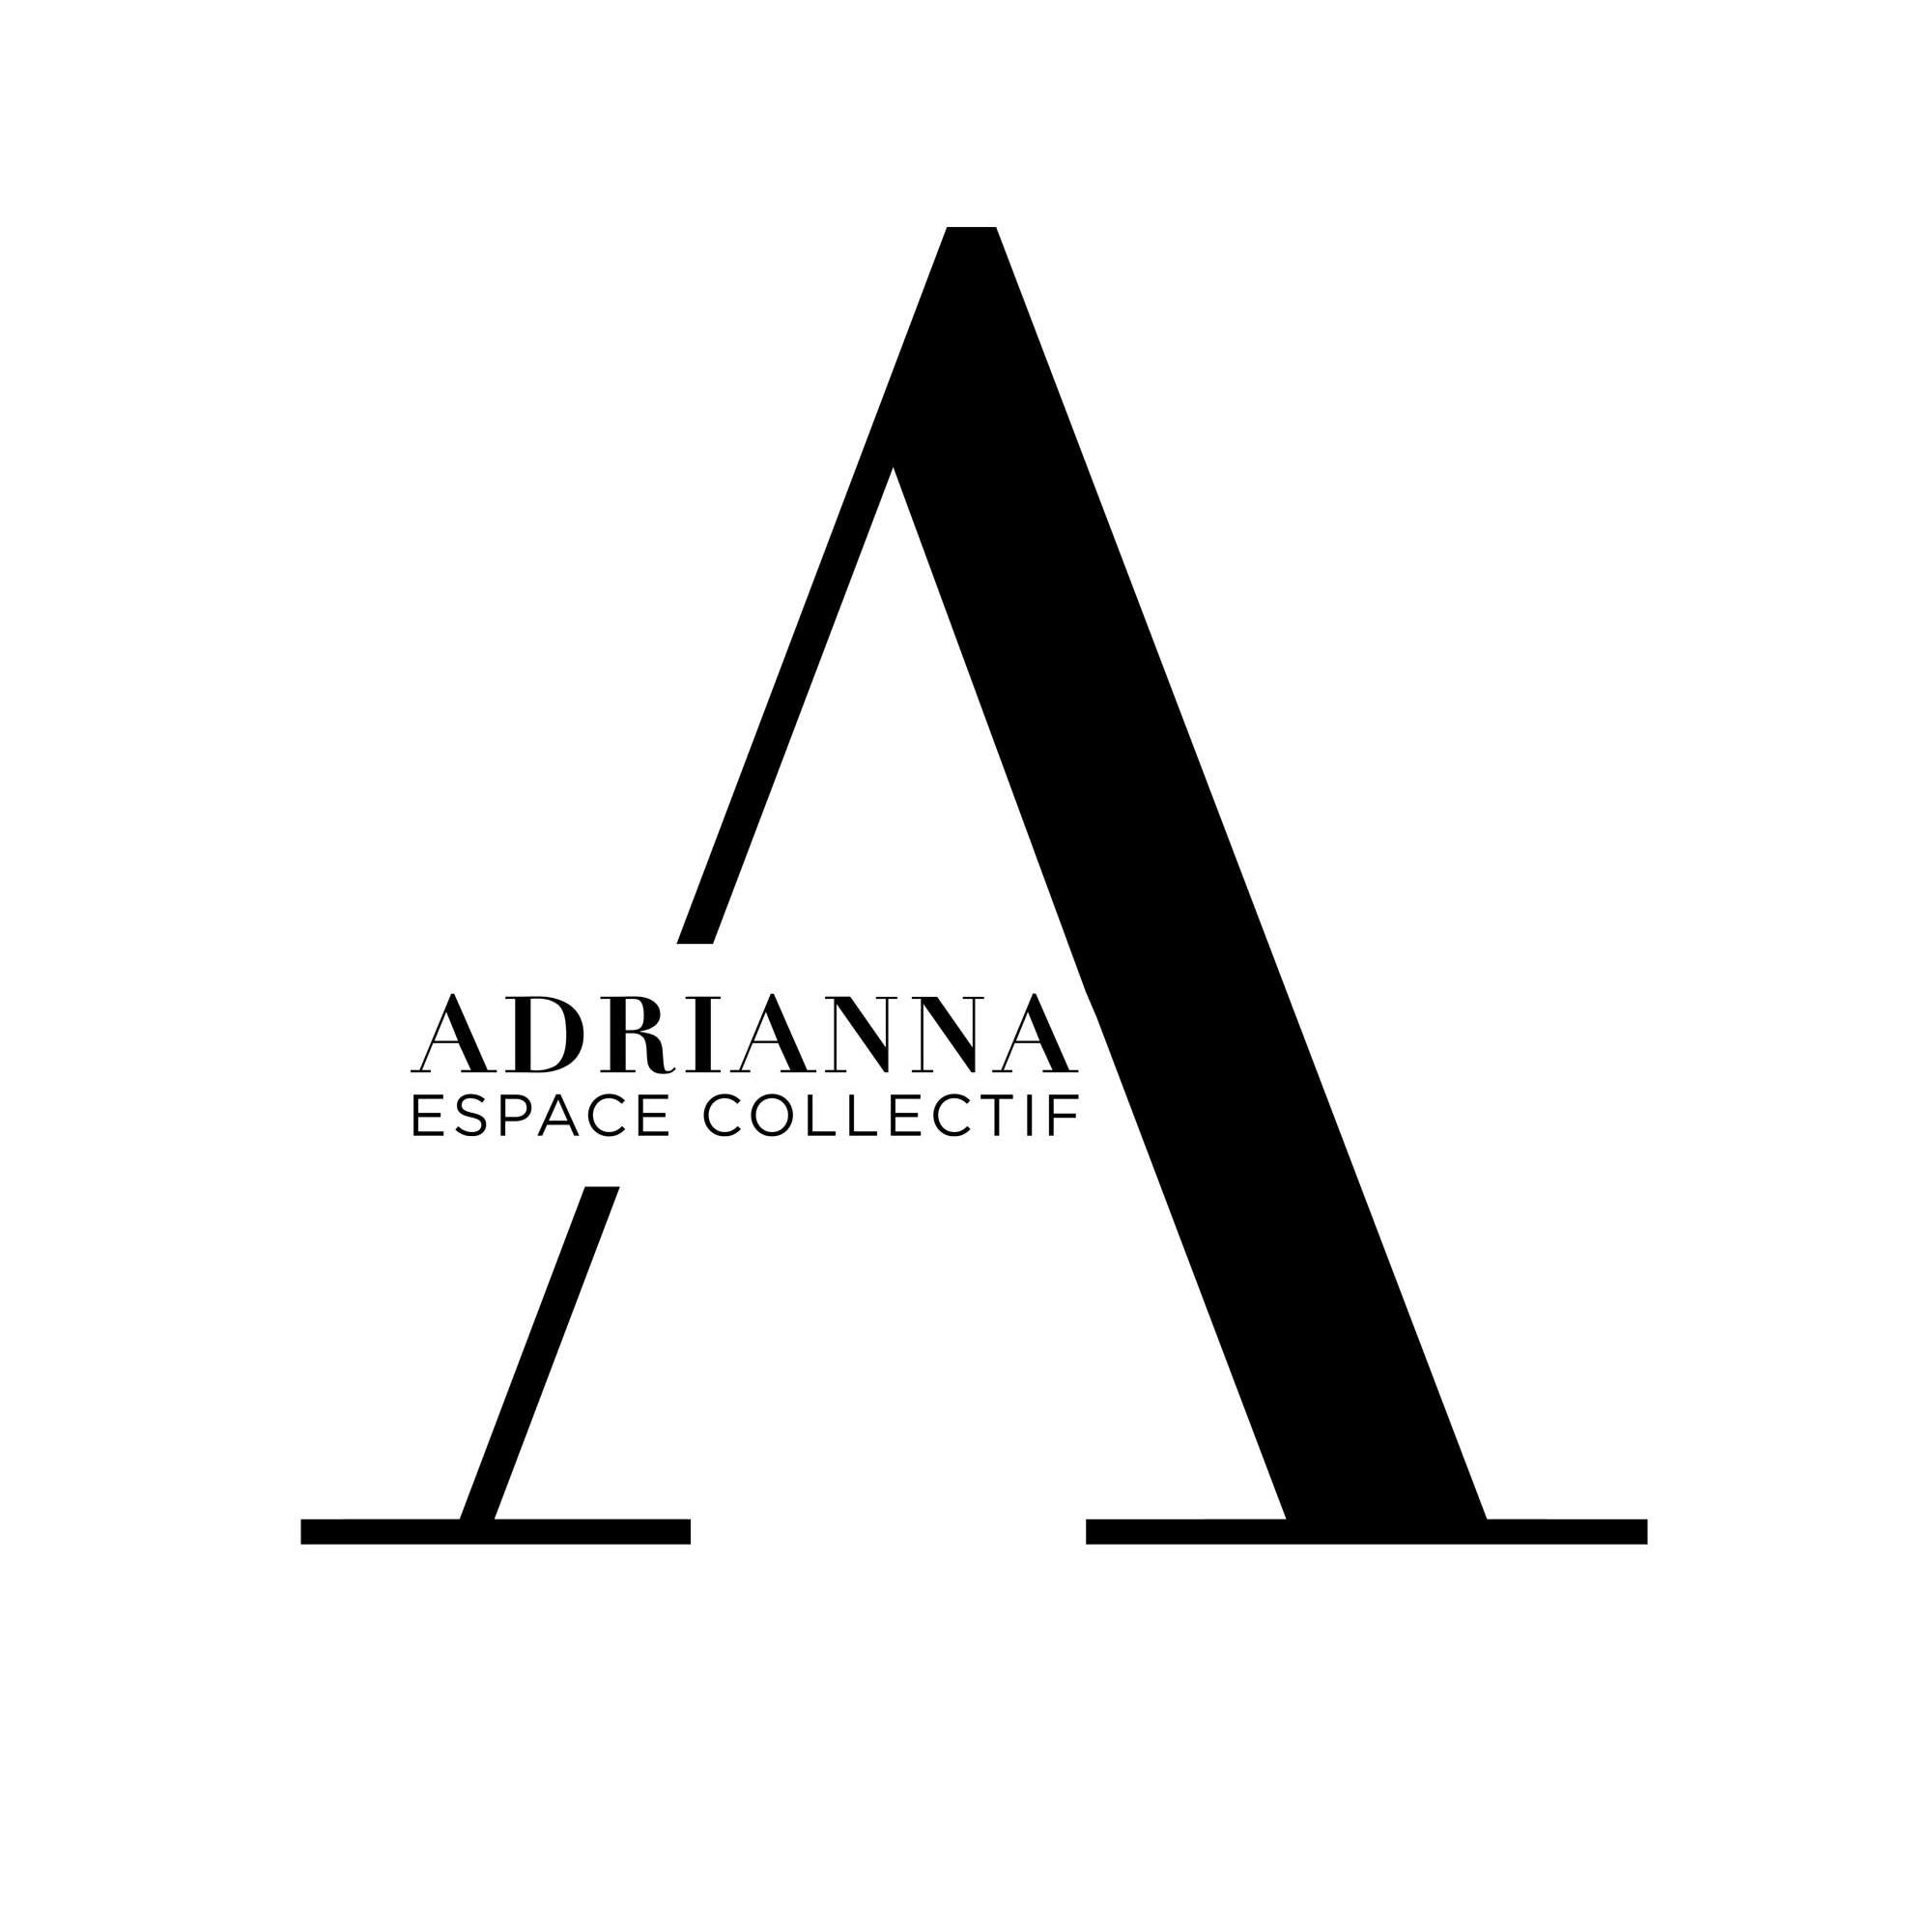 Adrianna Espace Collectif